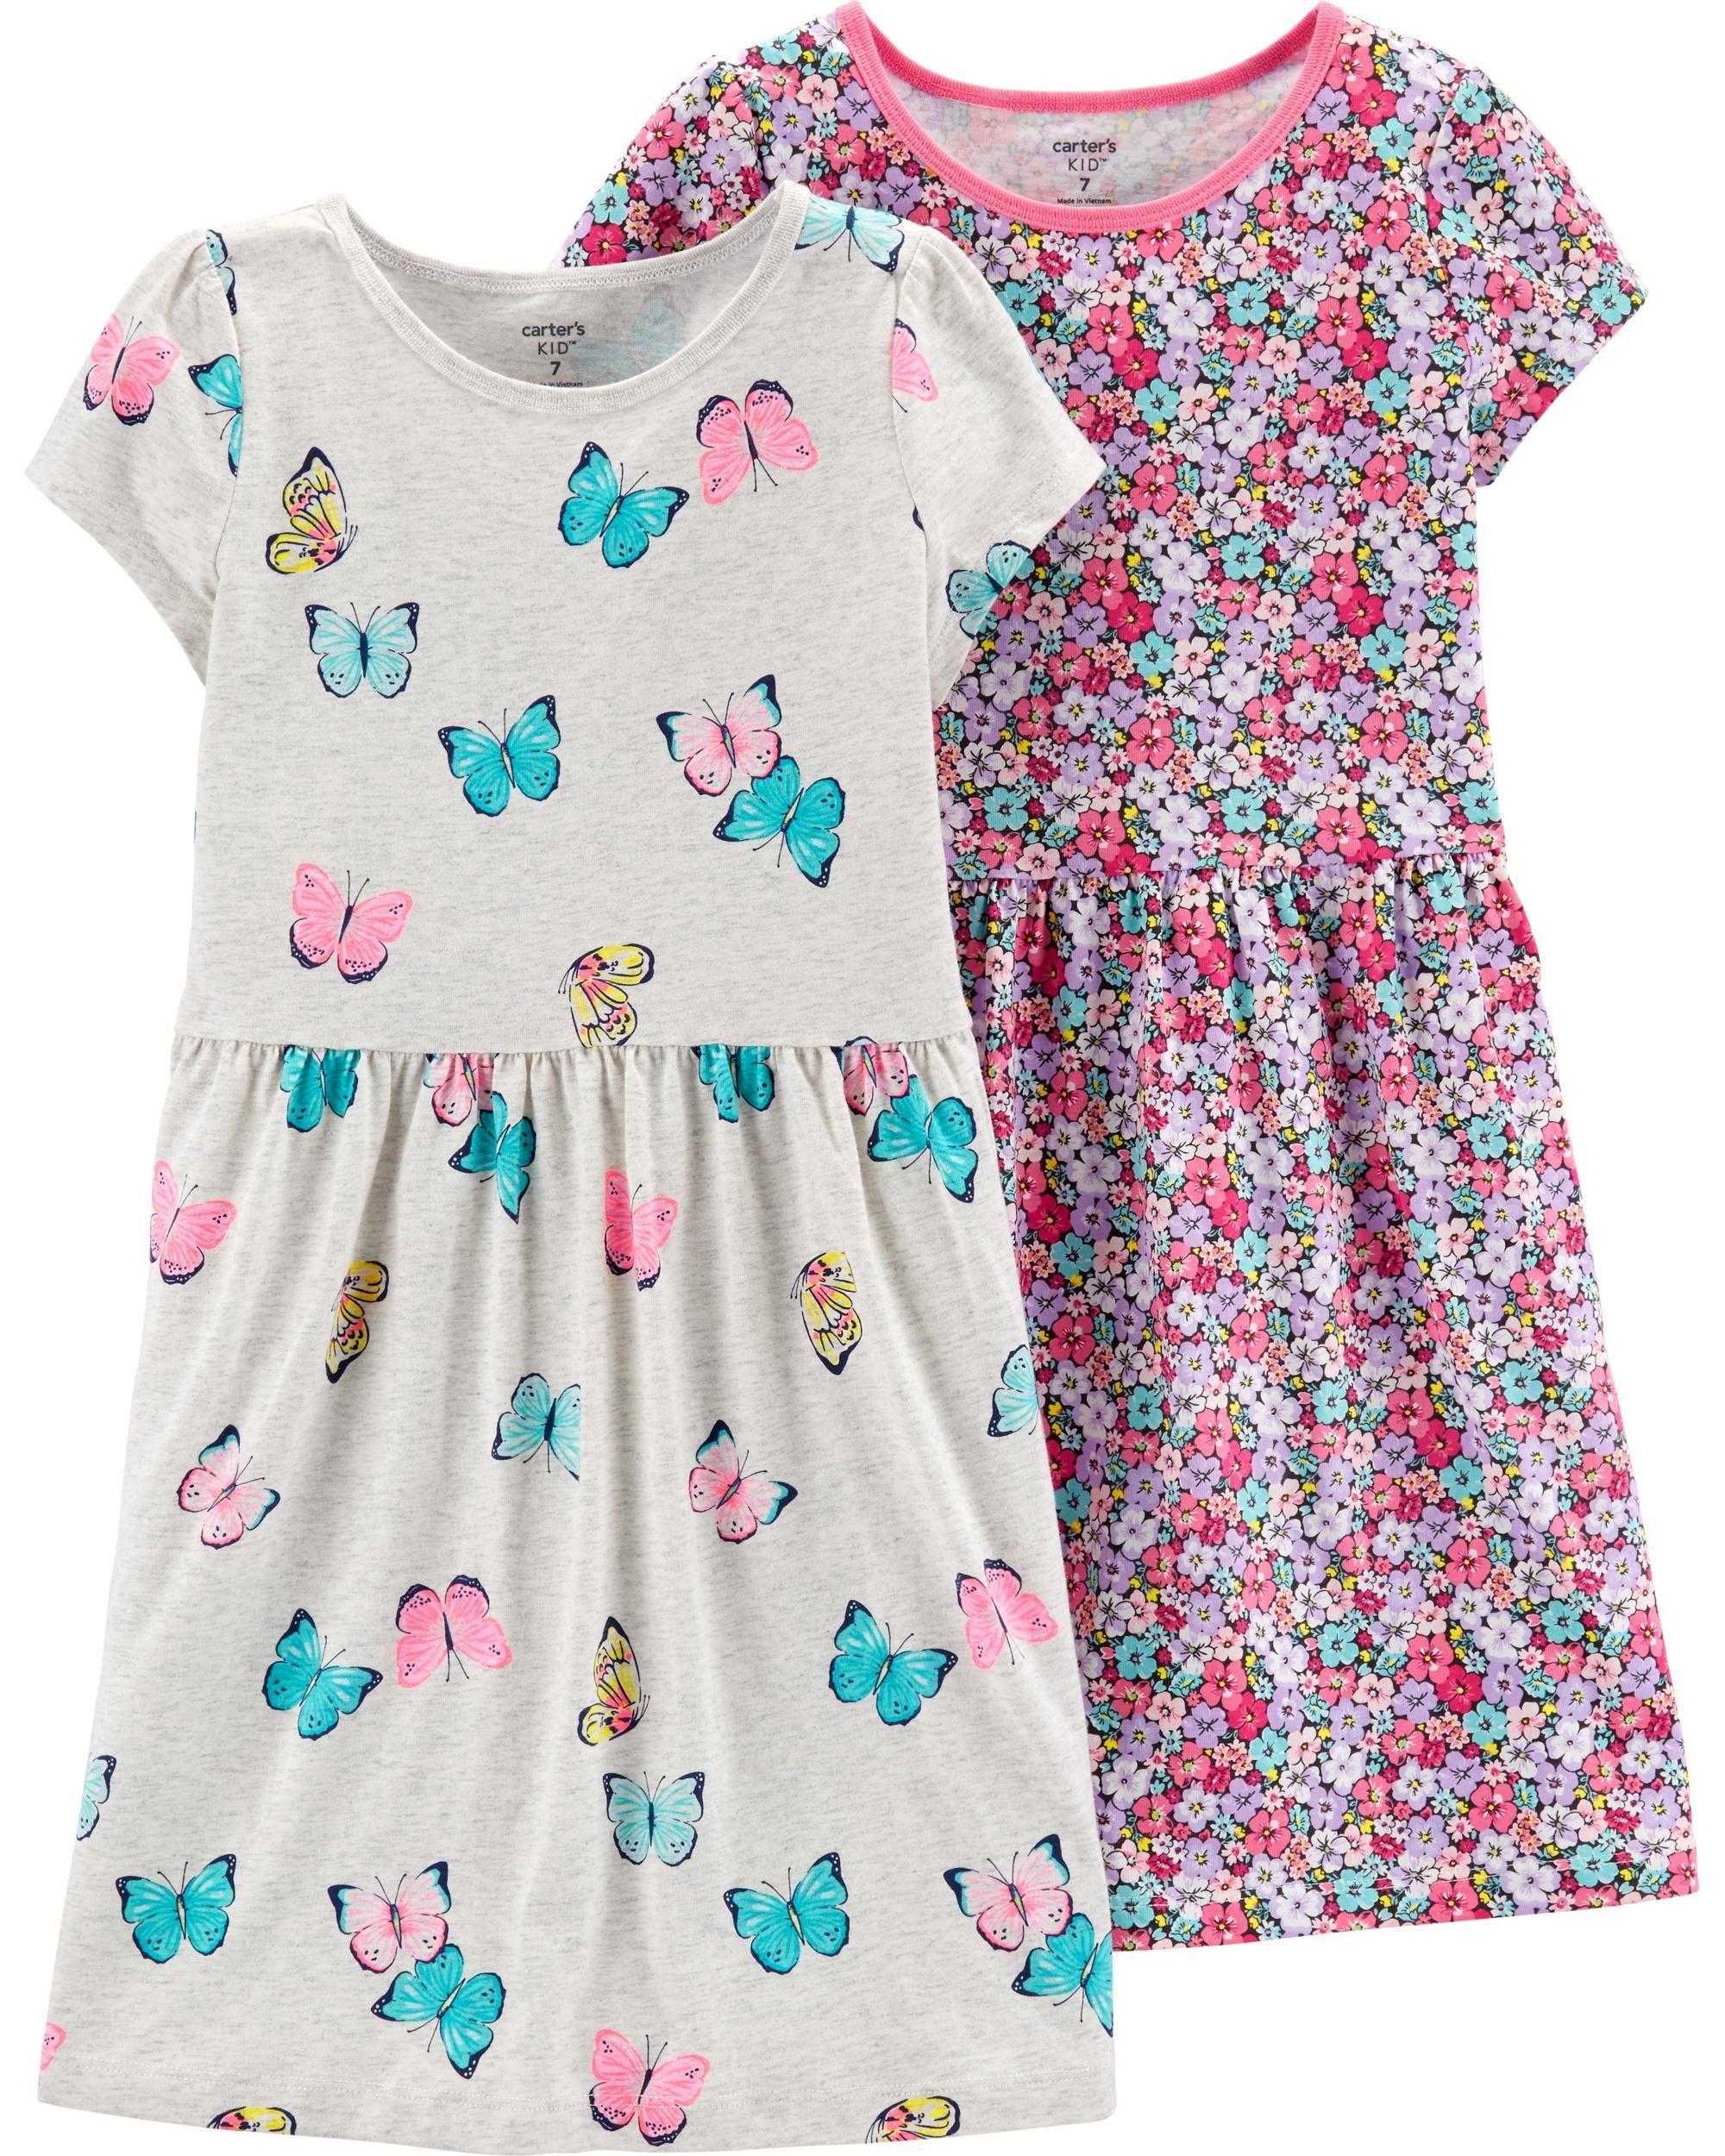 473016b96ba6 2-Pack Jersey Dress Set | Carters.com Dresses Kids Girl, Toddler Girl